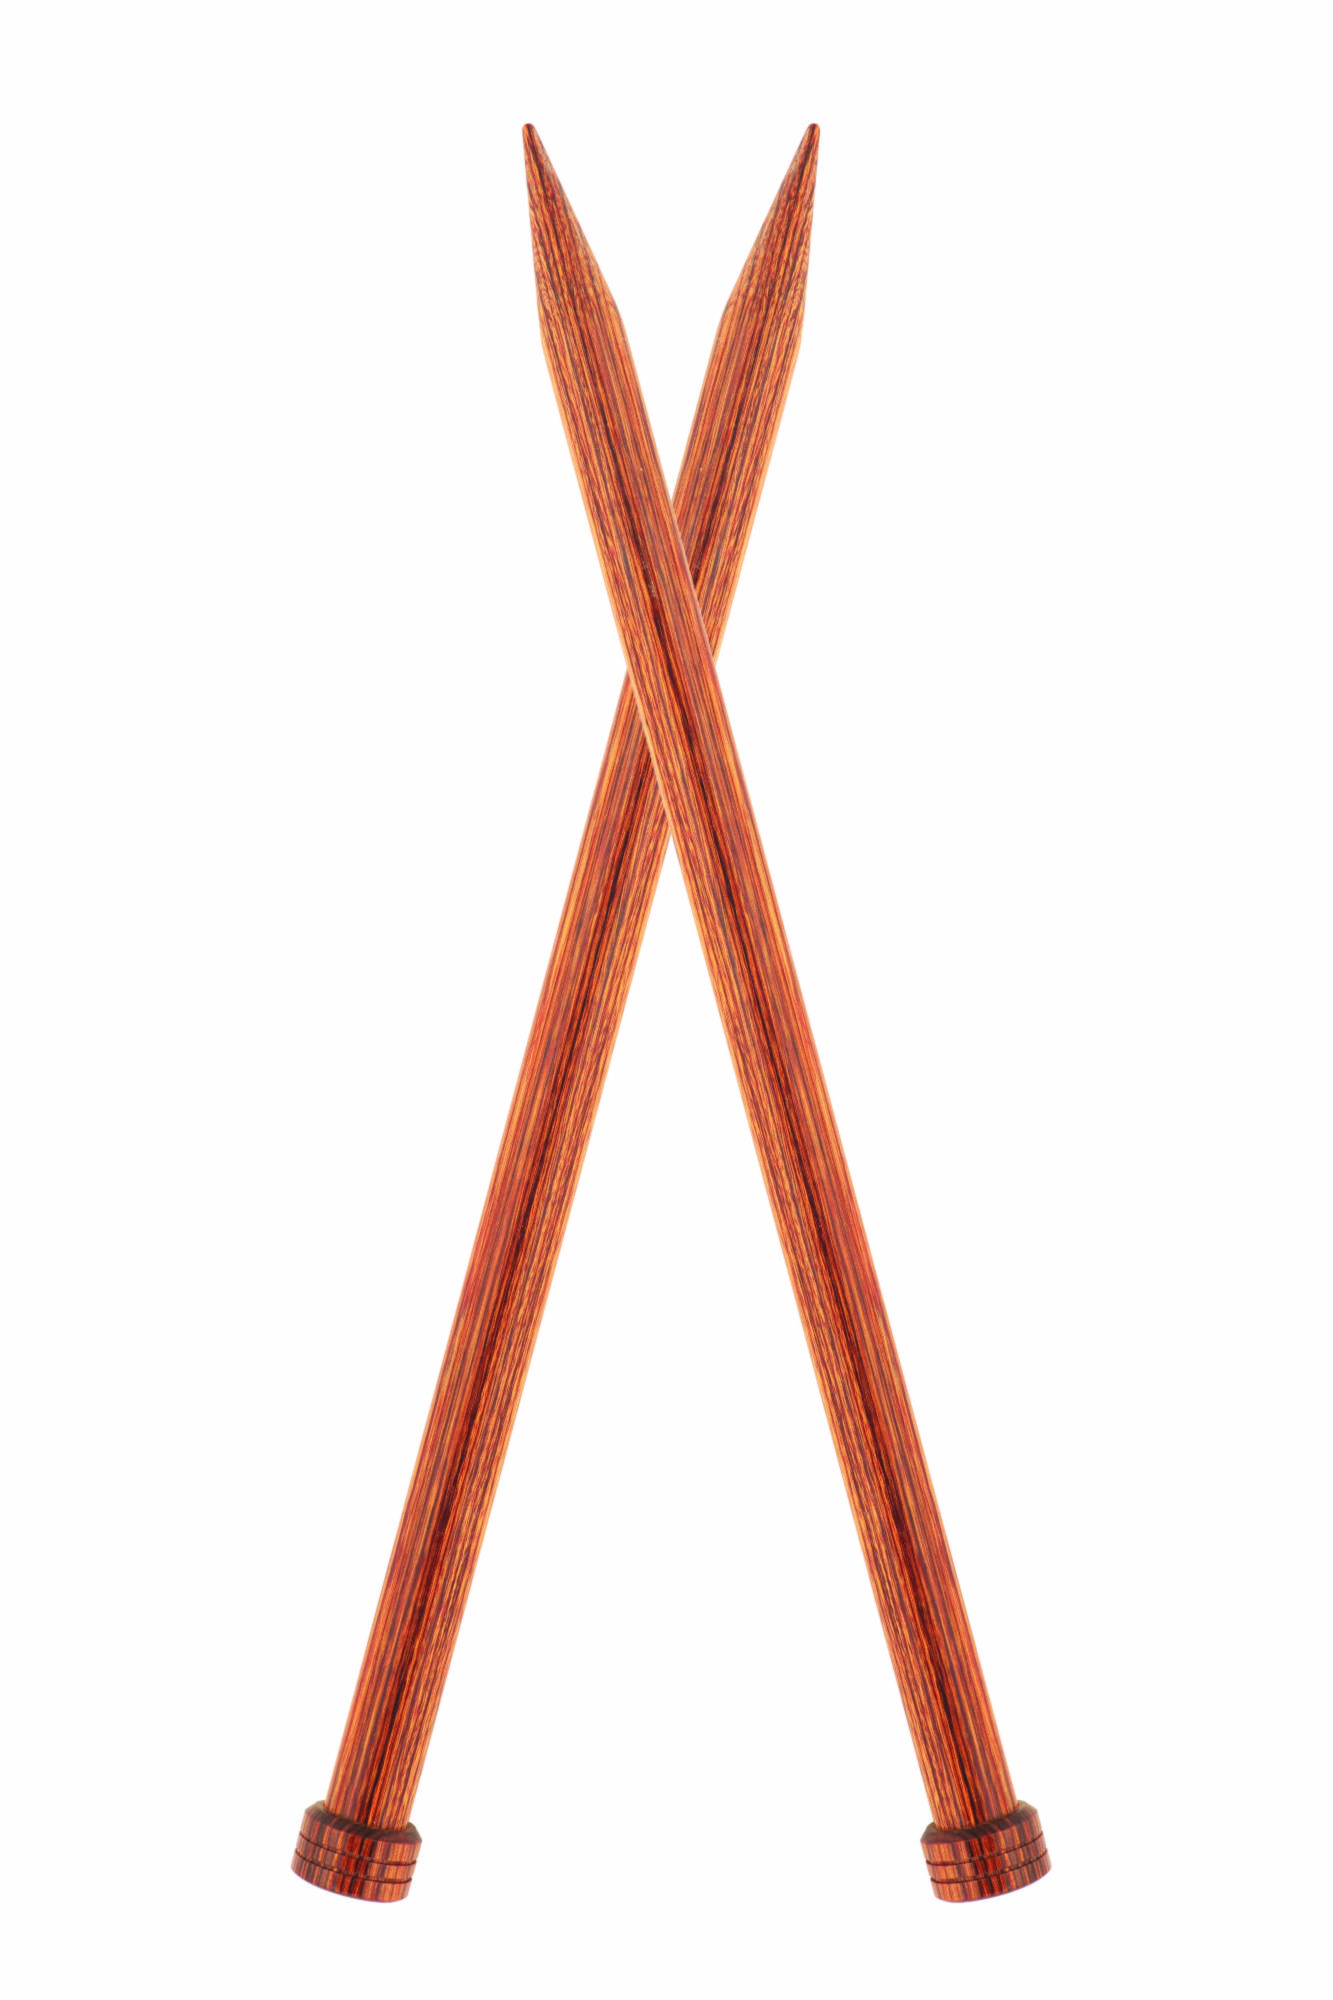 31182 Спицы прямые 3.25 мм - 35 см Ginger KnitPro